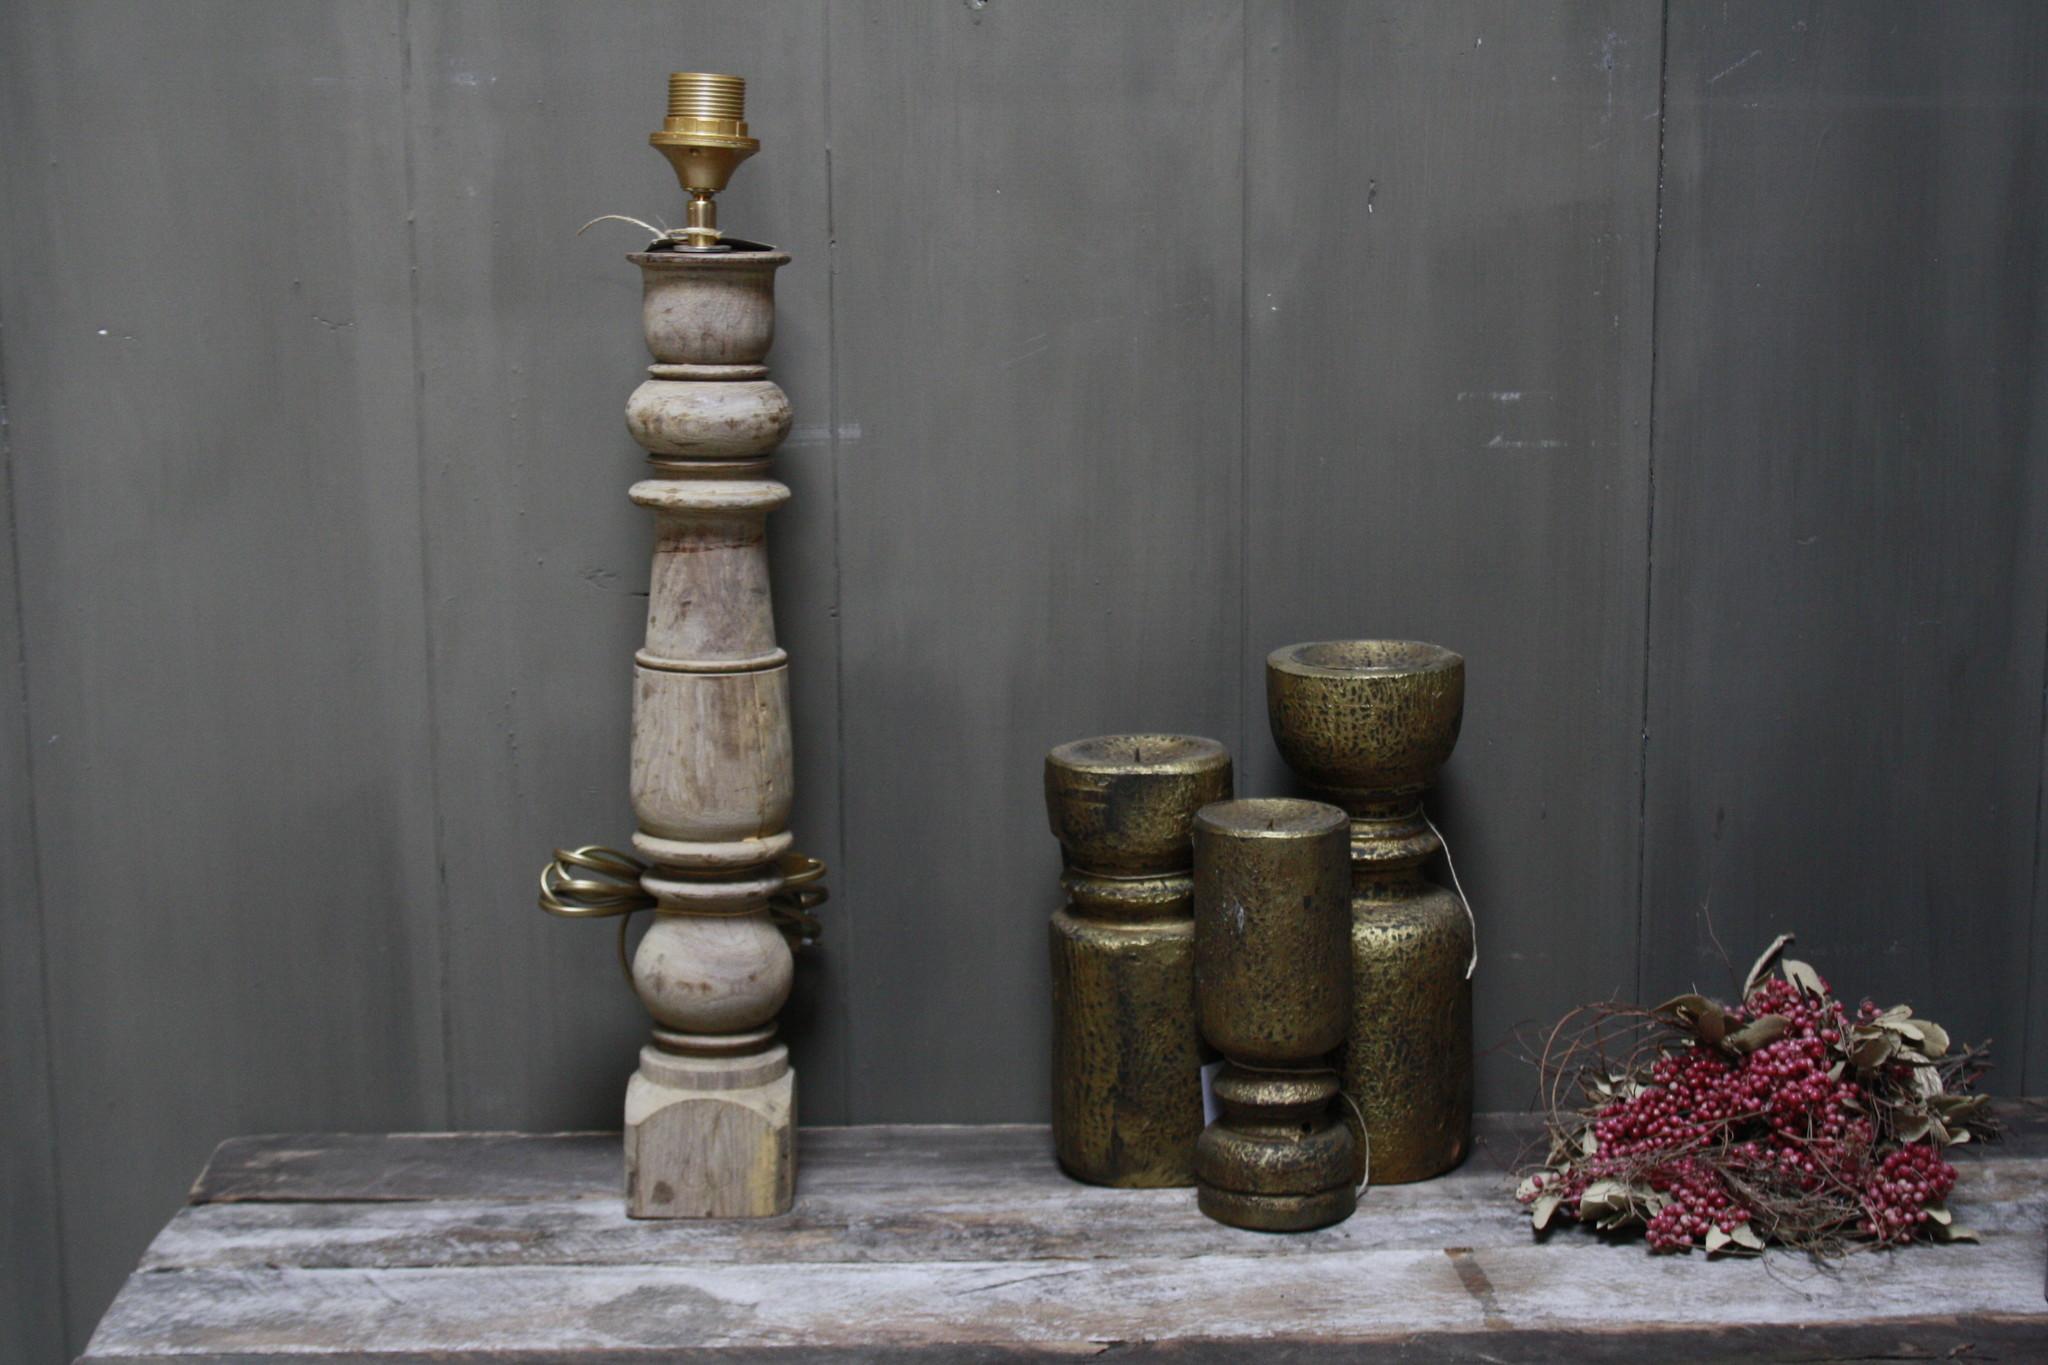 Aura peeperkorn oud houten baluster lamp 60 cm-2